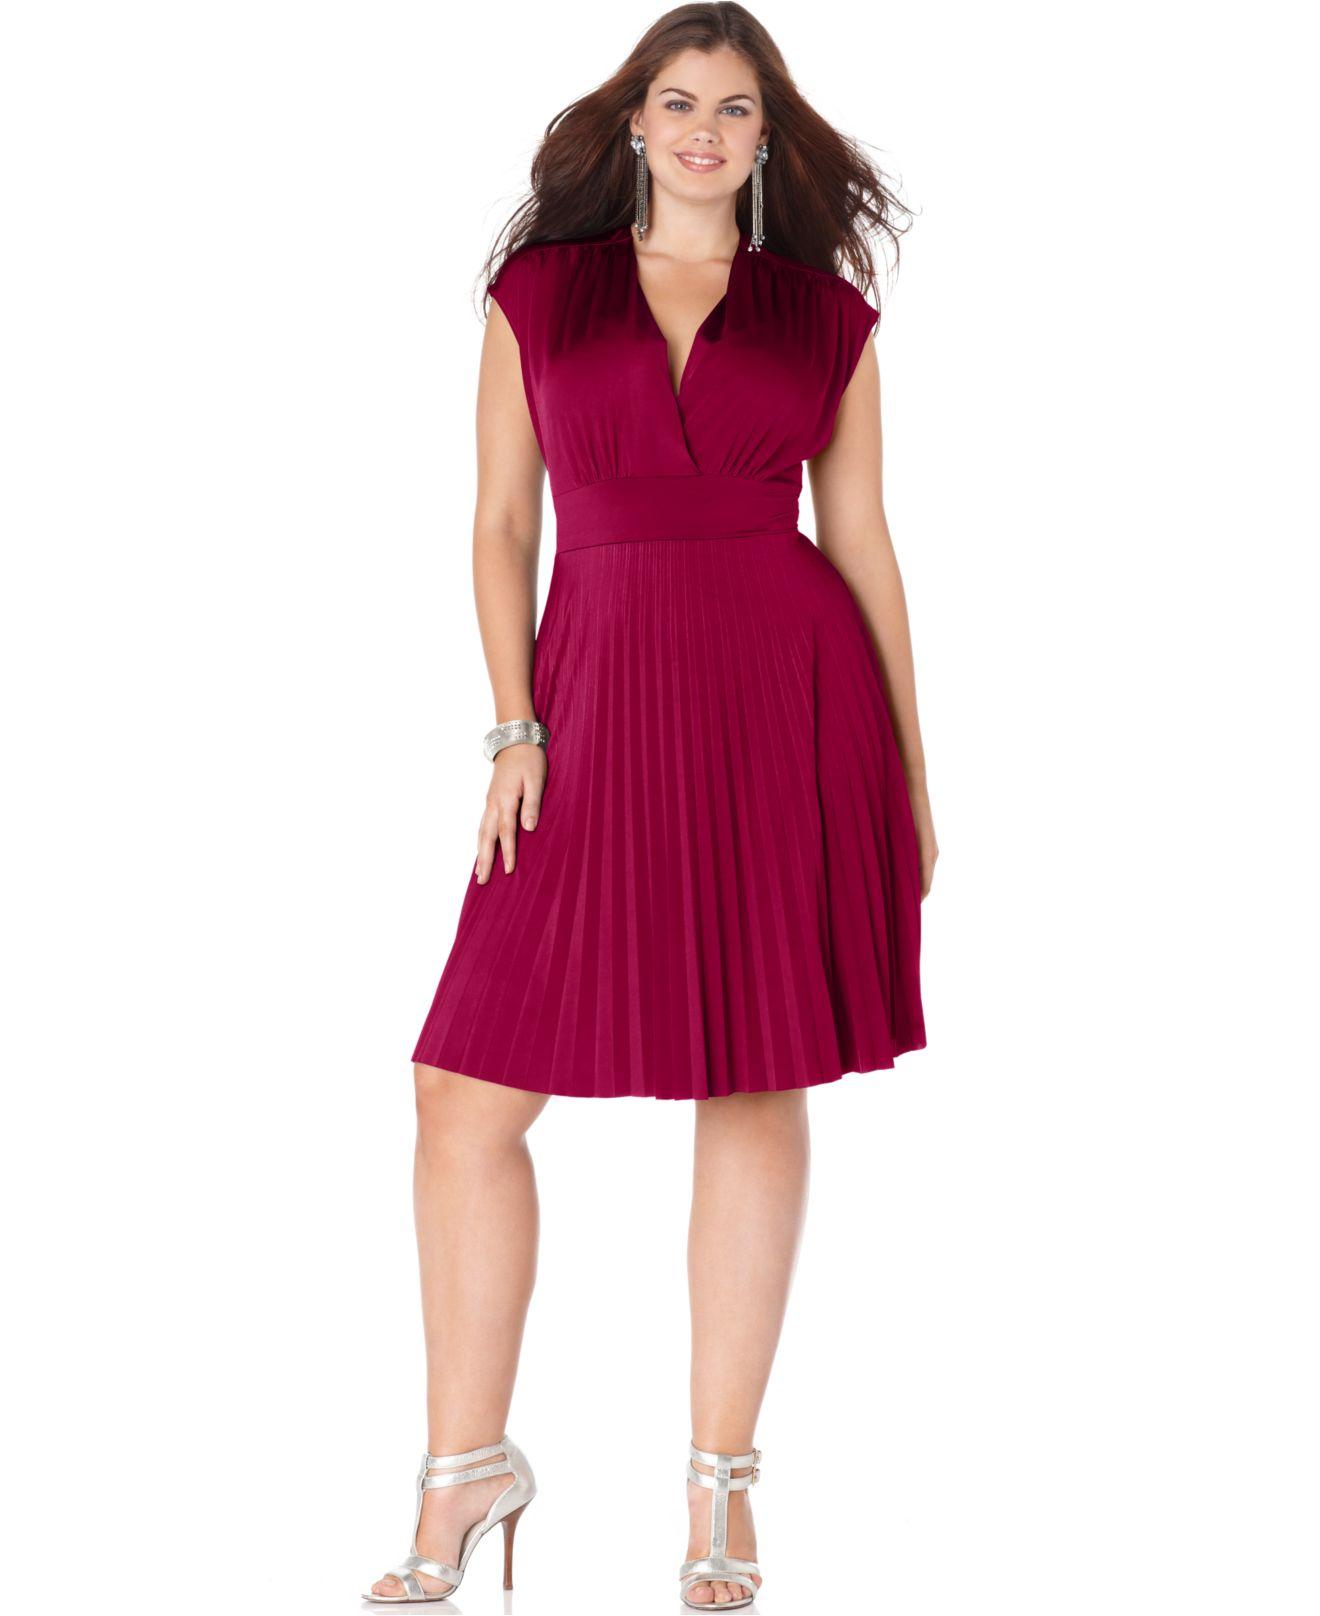 Prom Dresses Plus Size Macys